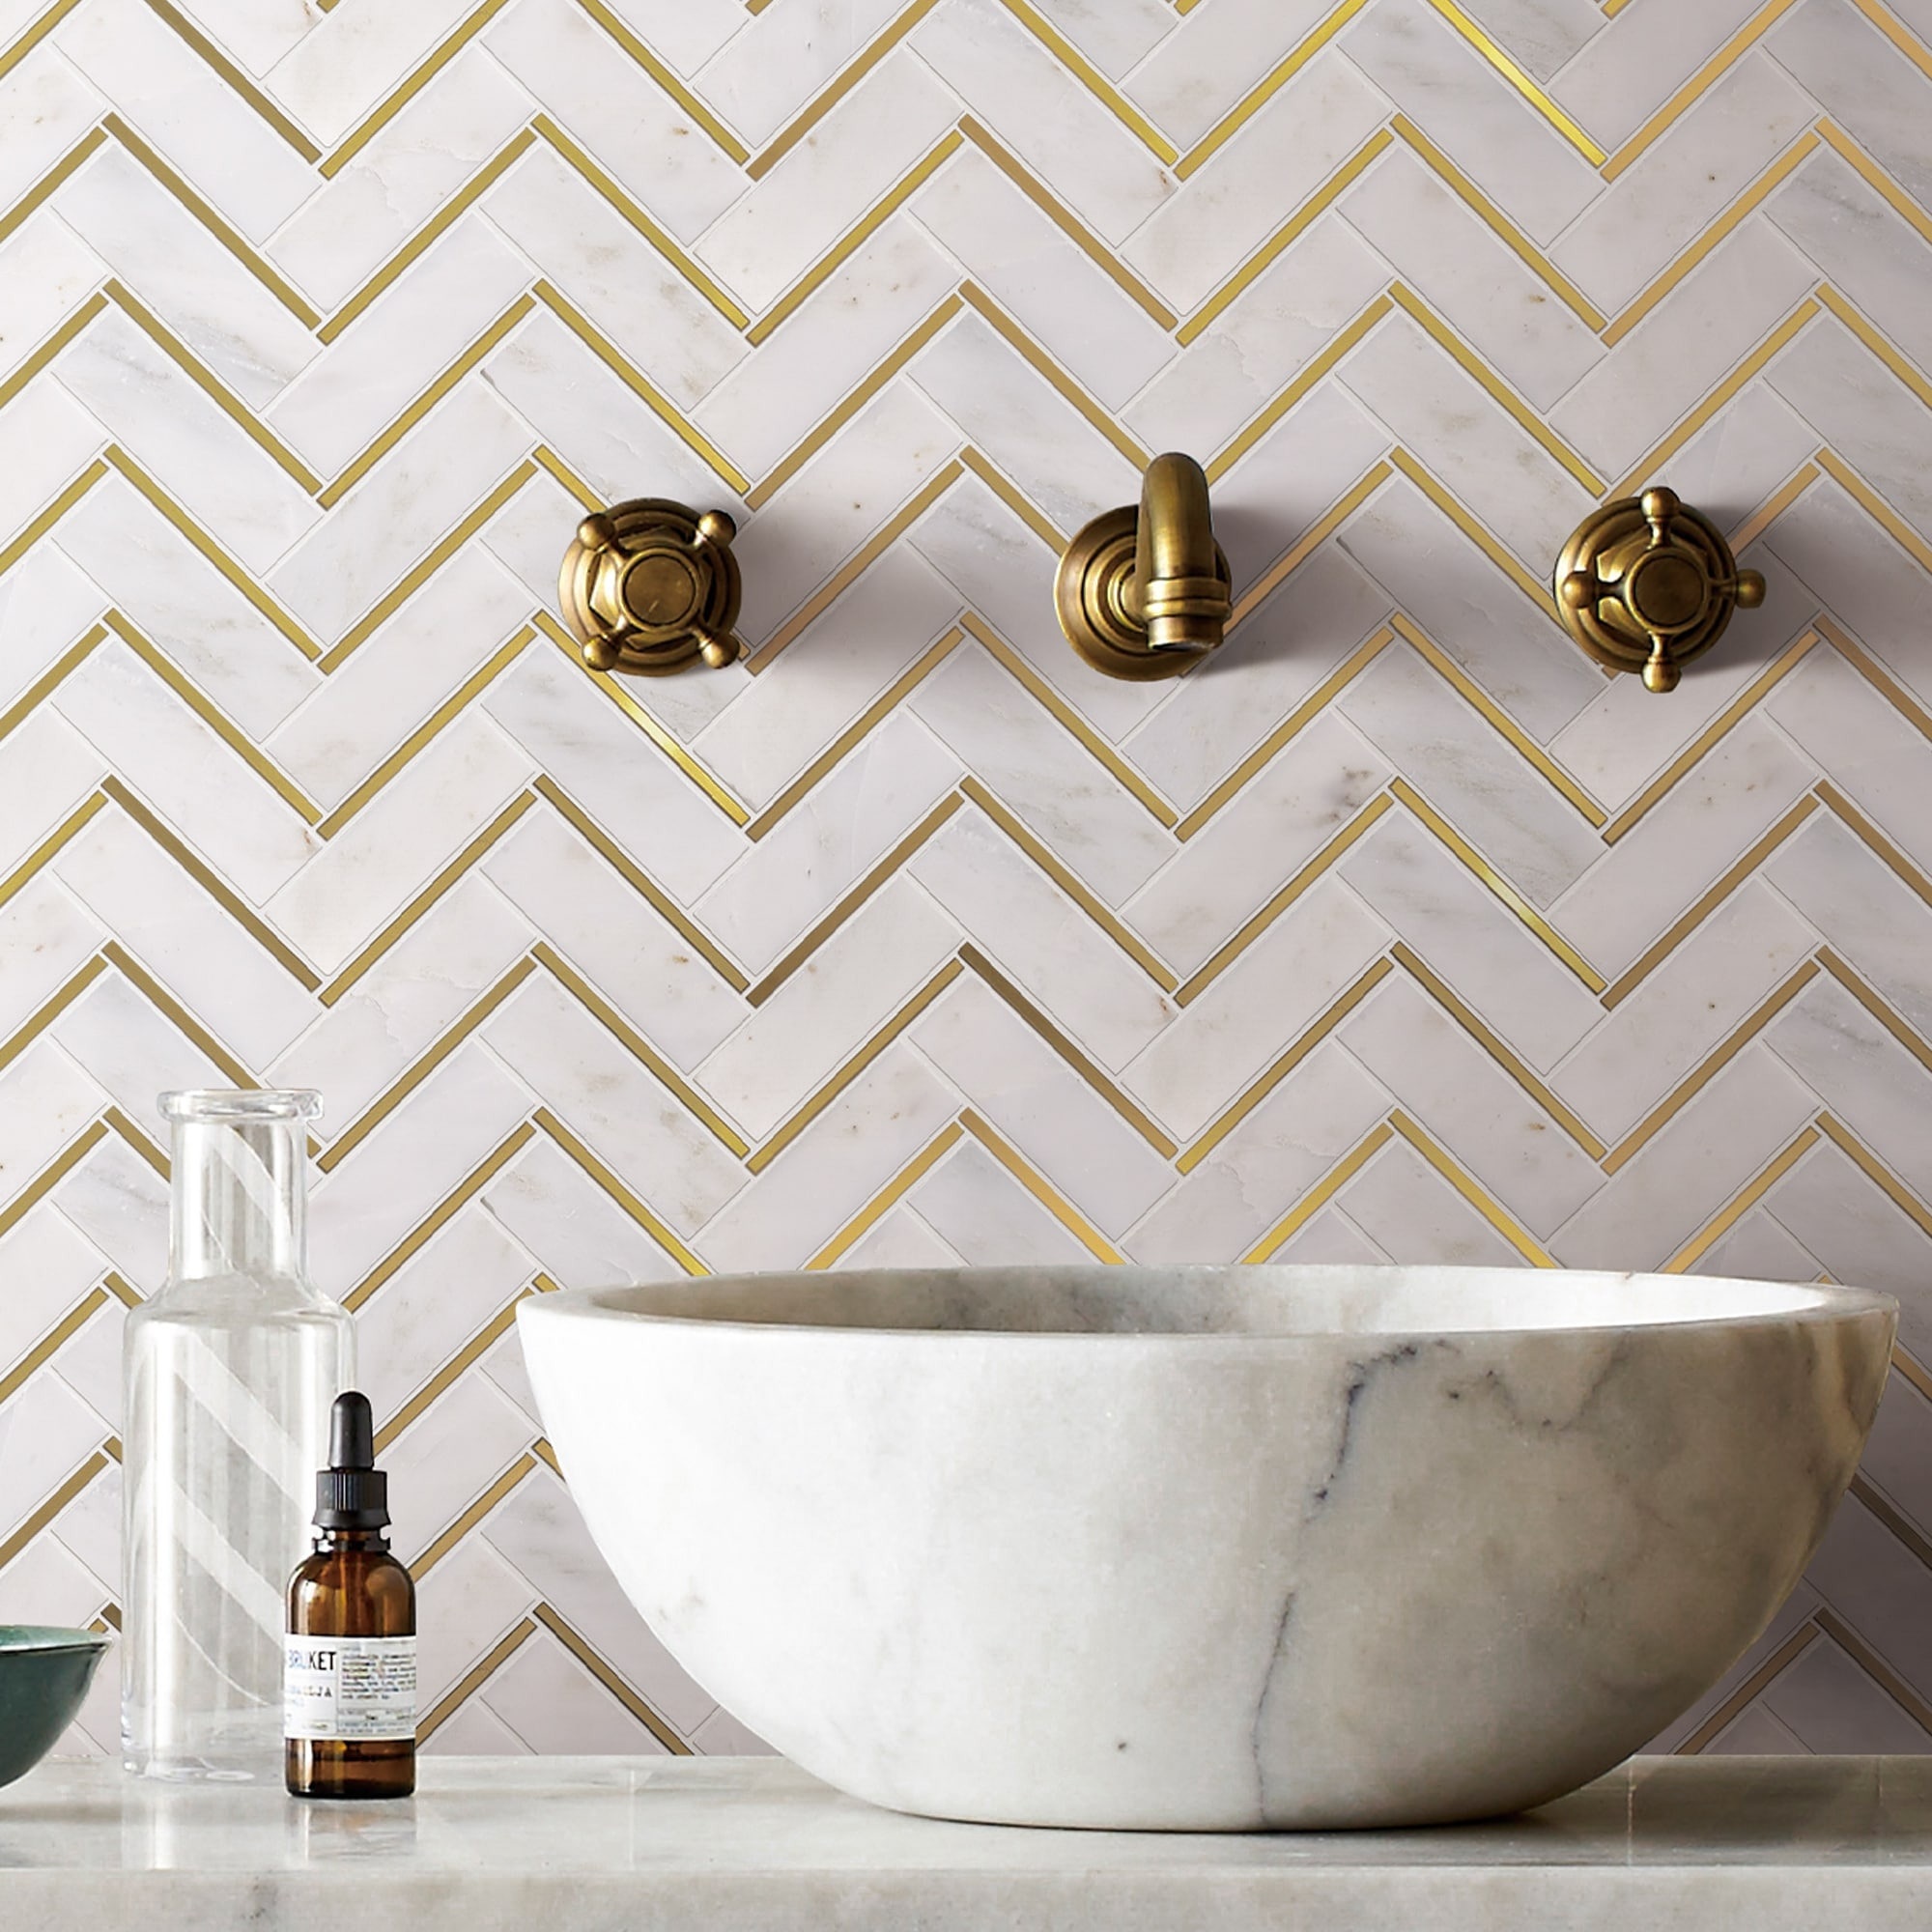 tilegen natural bianco herringbone metal and marble mosaic tile in gold white wall tile 10 sheets 8 5sqft